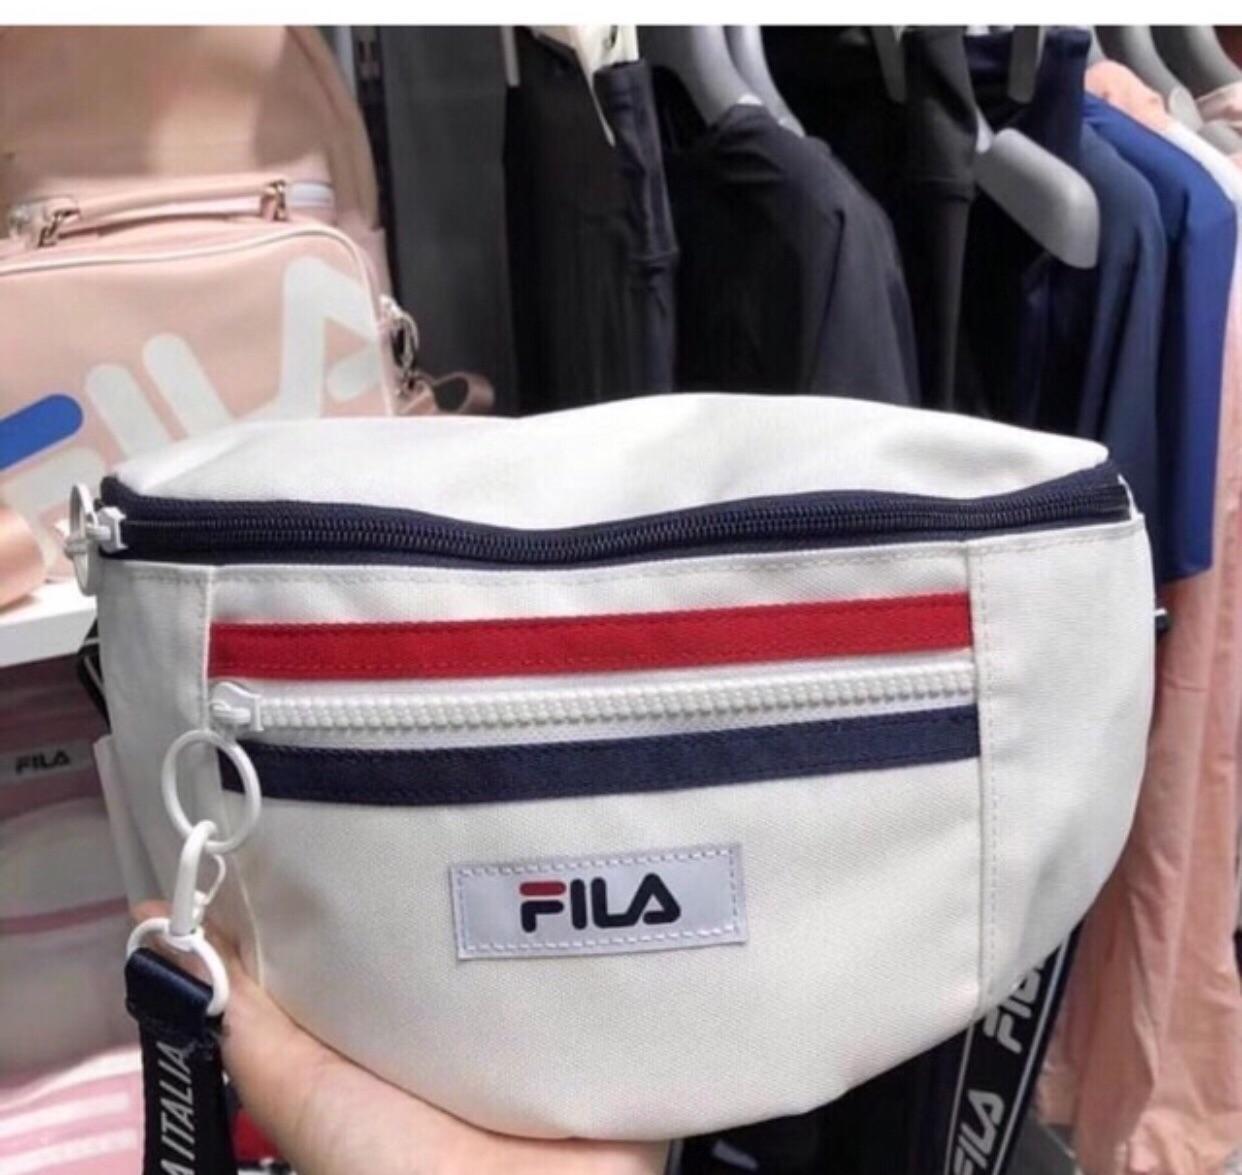 Fila Philippines: Fila price list - Sneakers & Running